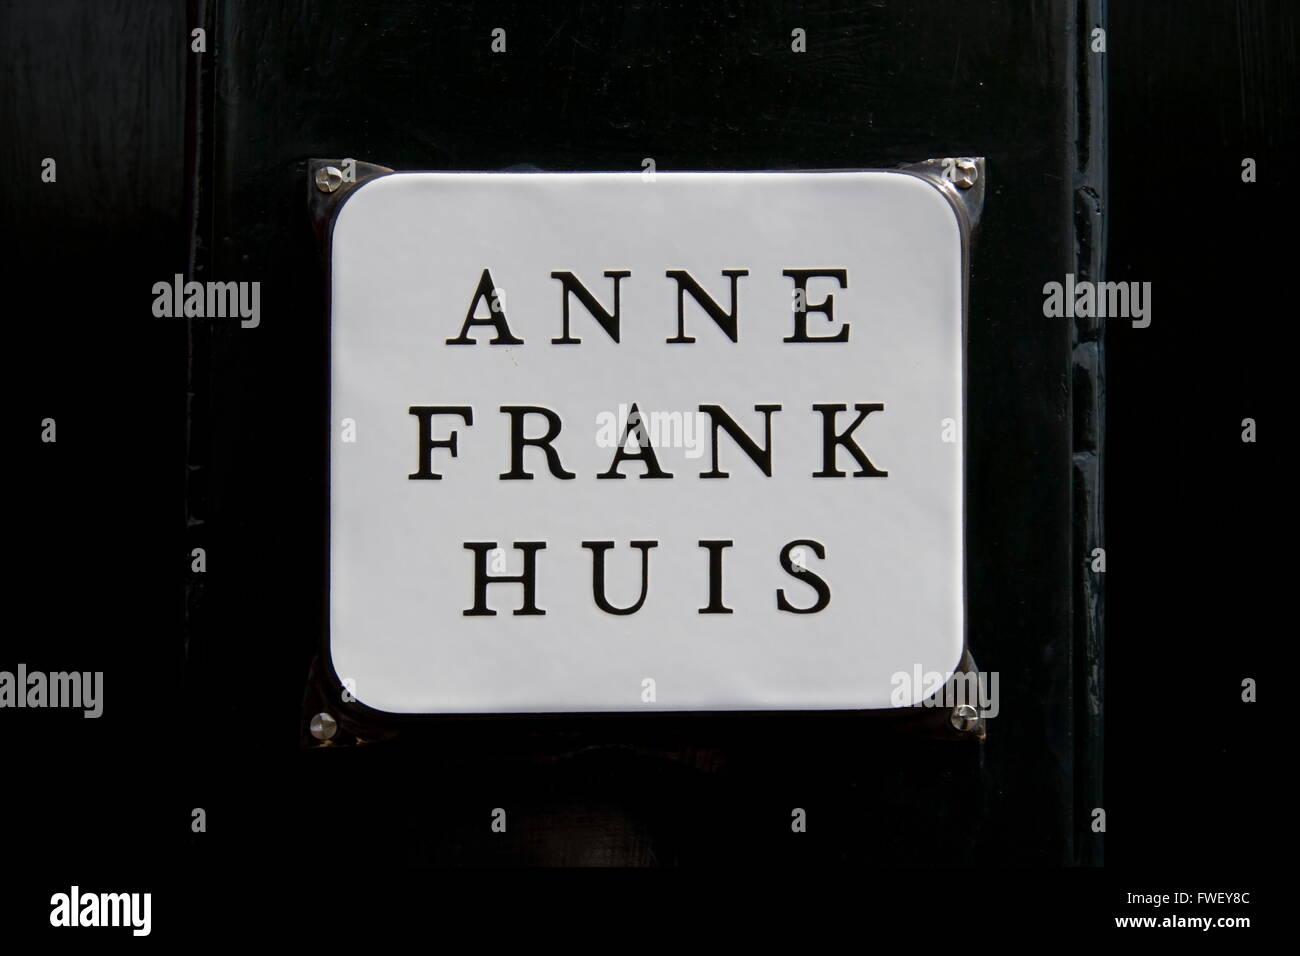 Anne Frank House, Amsterdam, Netherlands - Stock Image